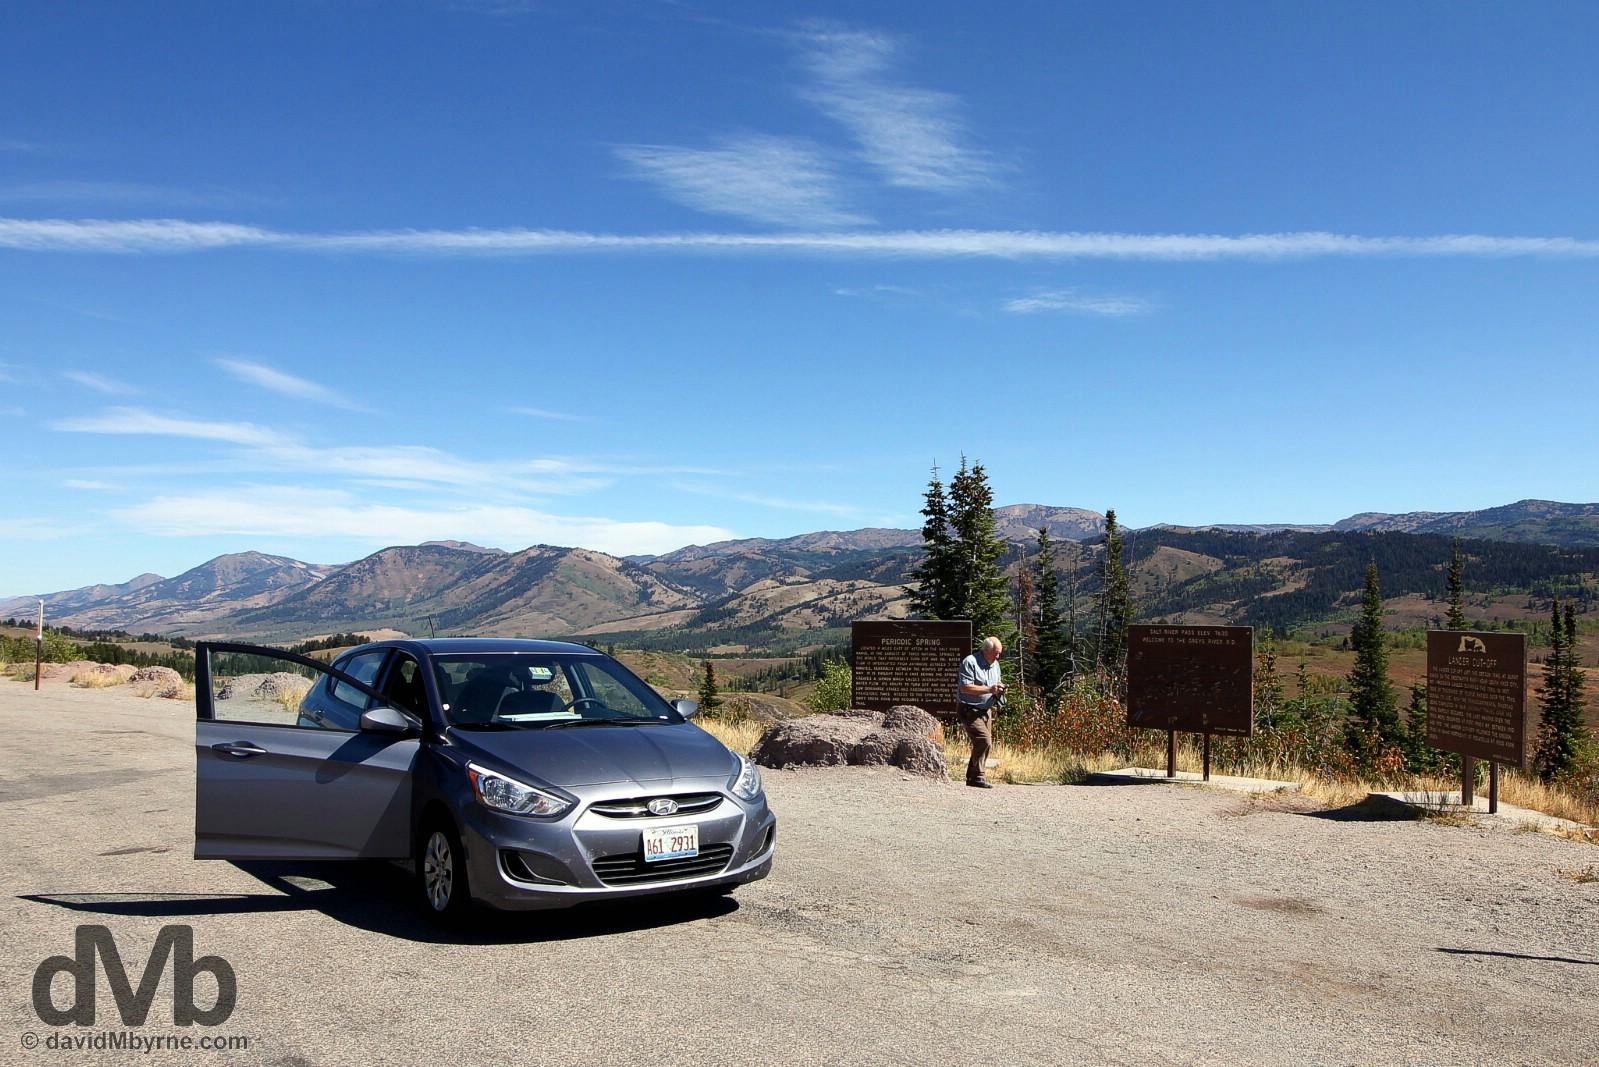 Atop the Salt River Pass of the Salt River Range, western Wyoming, USA. September 6, 2016.